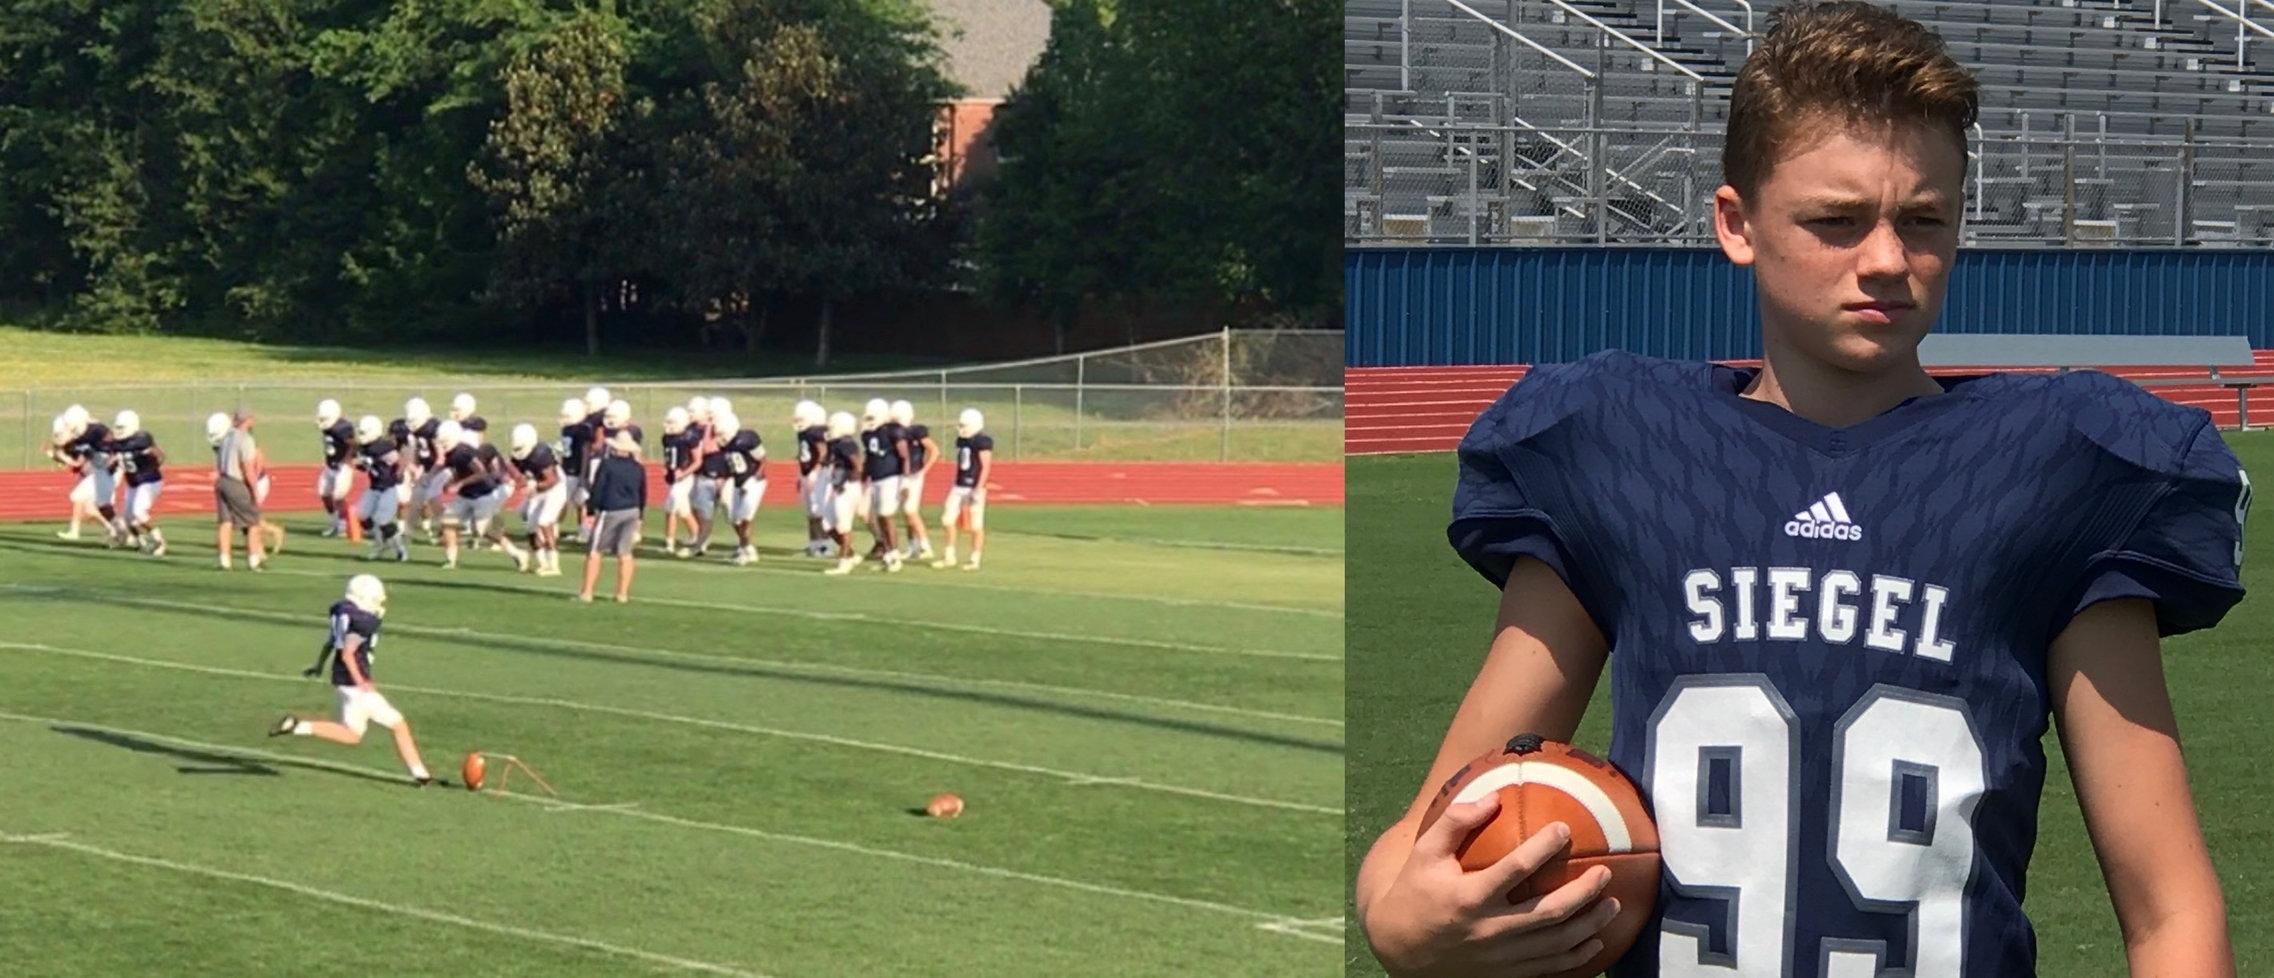 Drew Sledge @sledge_drew // Football place kicker and punter; soccer // Graduating class 2021